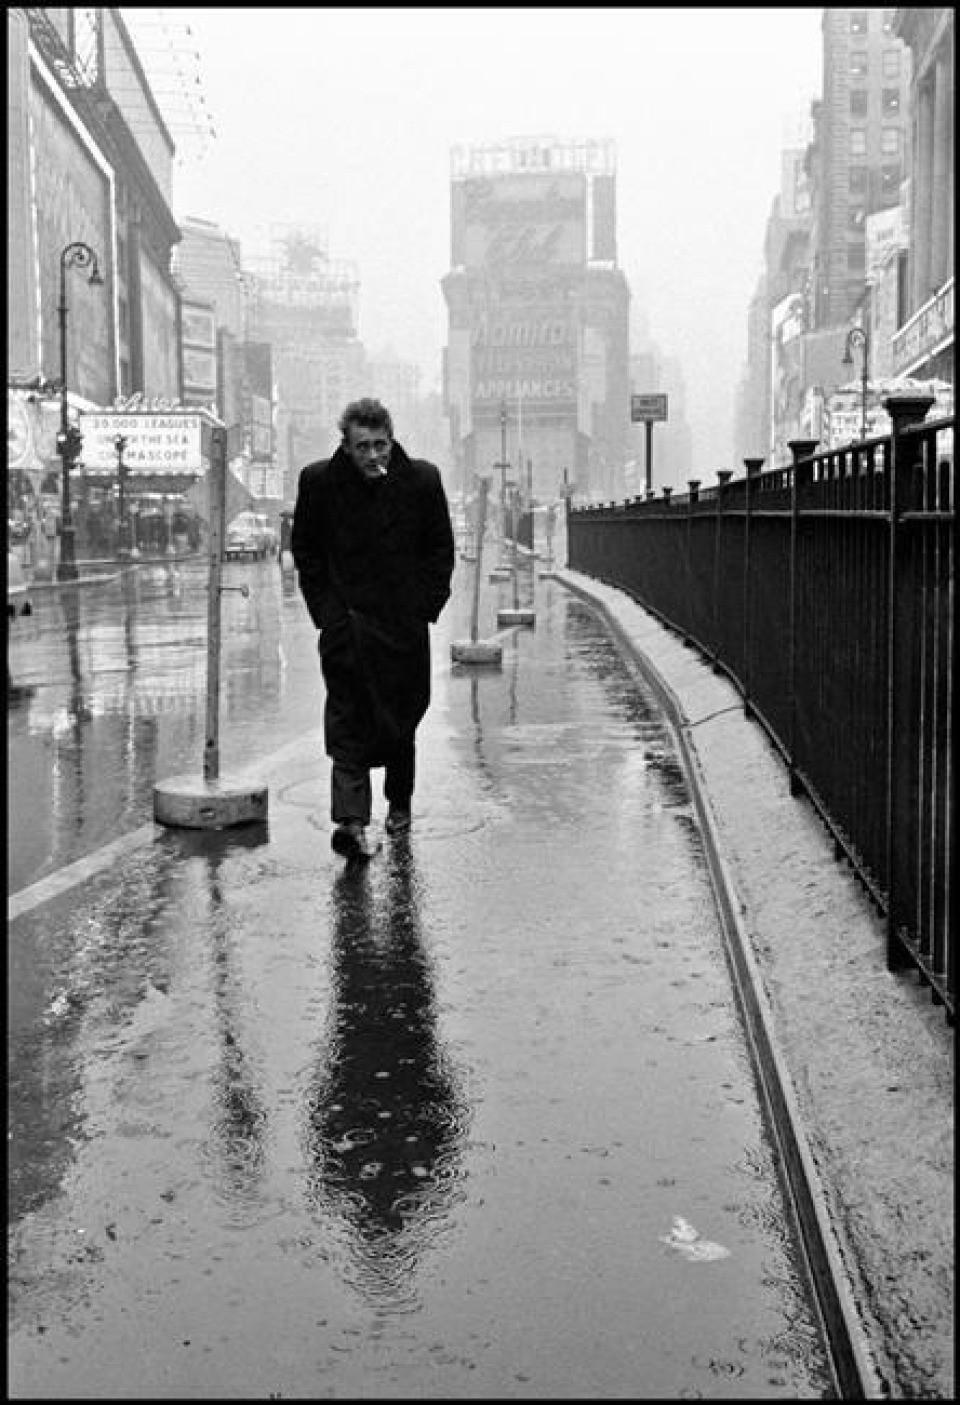 James Dean - image copyright Dennis Stock, Magnum 1955